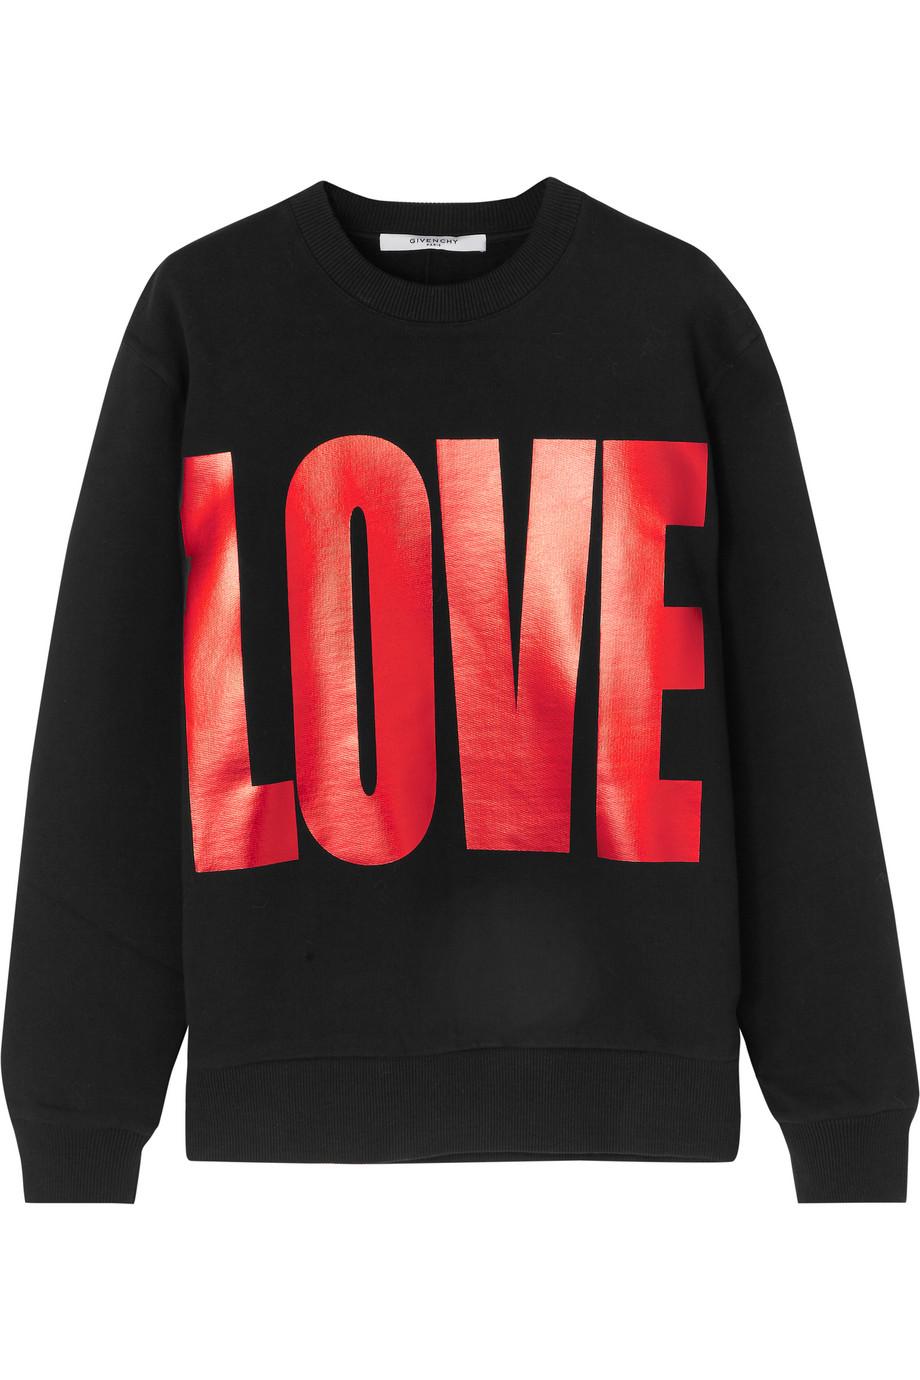 Givenchy Metallic Printed Sweatshirt in Black Cotton-Jersey, Women's, Size: XS